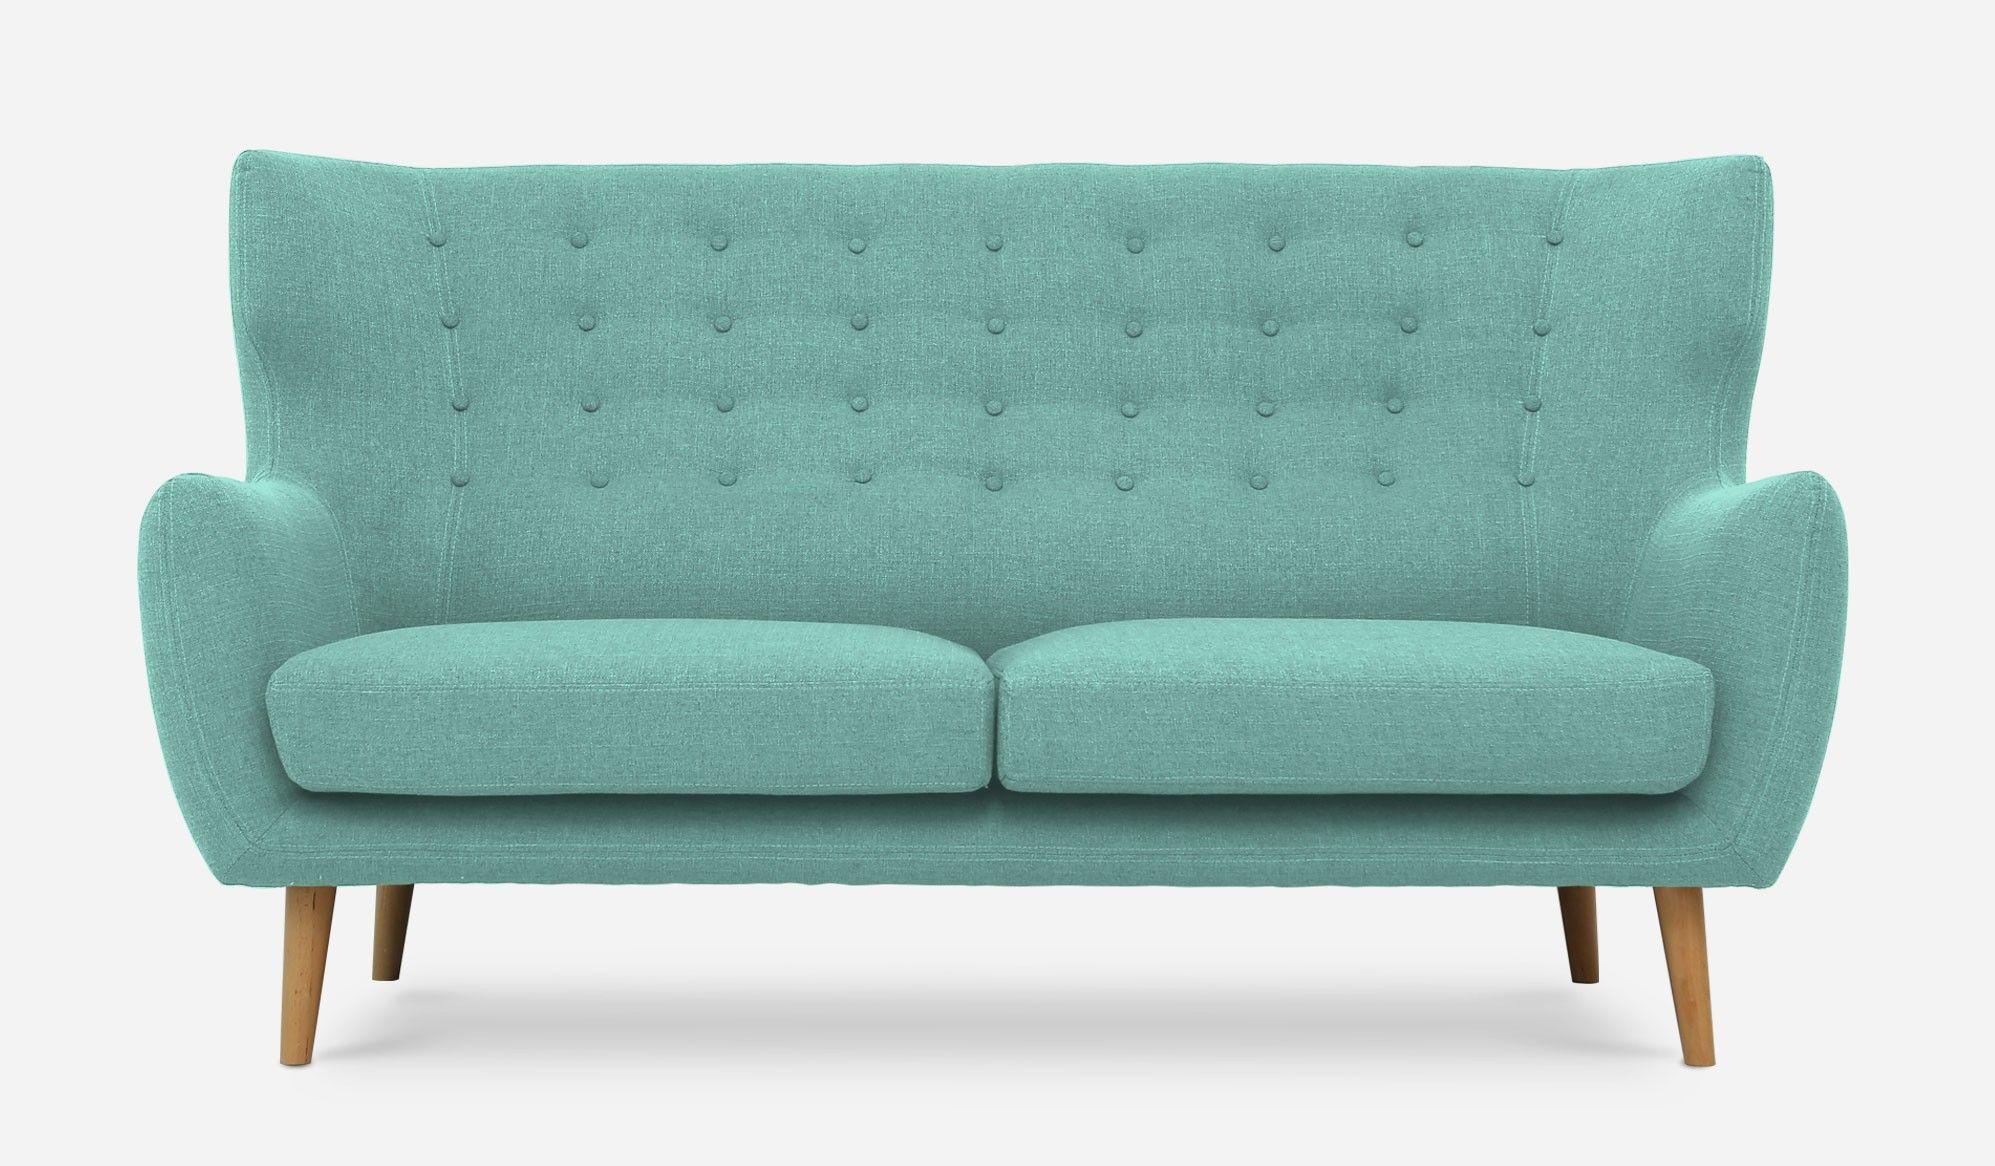 beck sofa tiffany blue by castlery - Tiffany Blue Living Room Pinterest